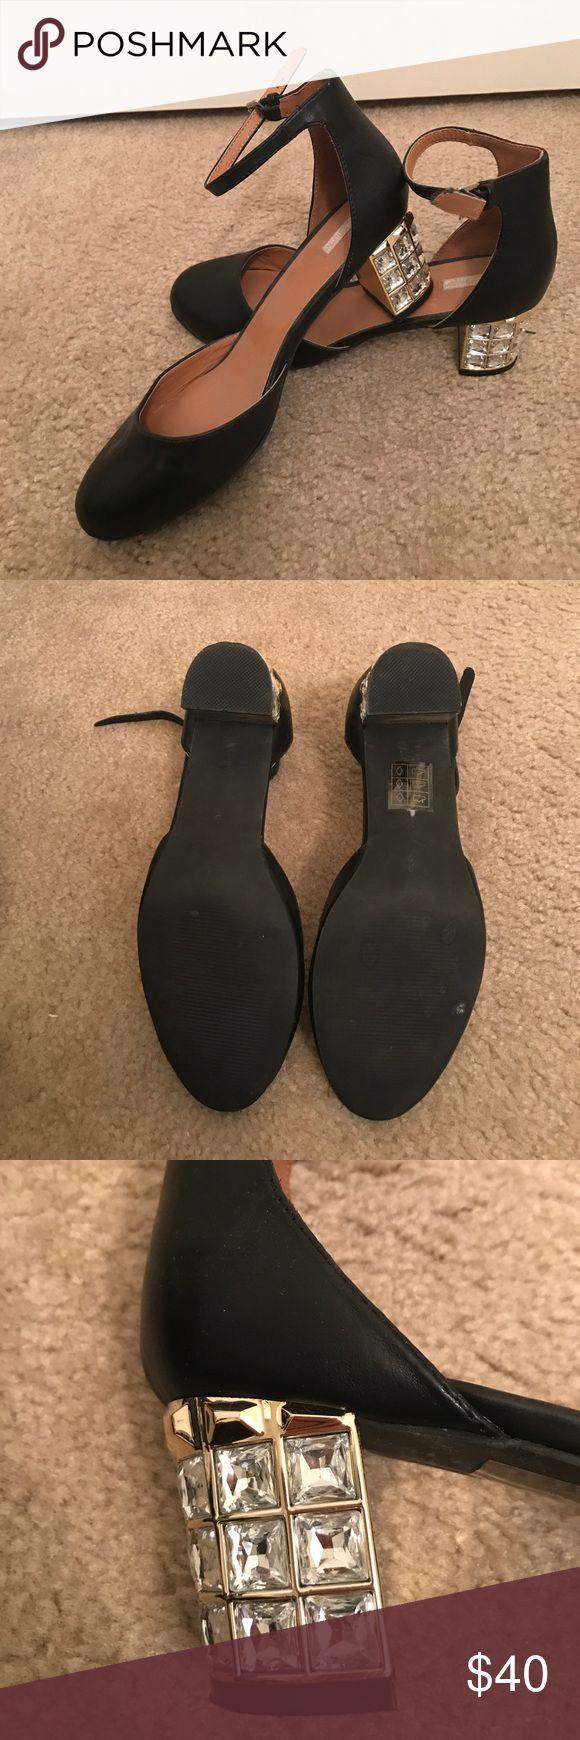 1000+ ideas about Rhinestone Heels on Pinterest | Sexy ...